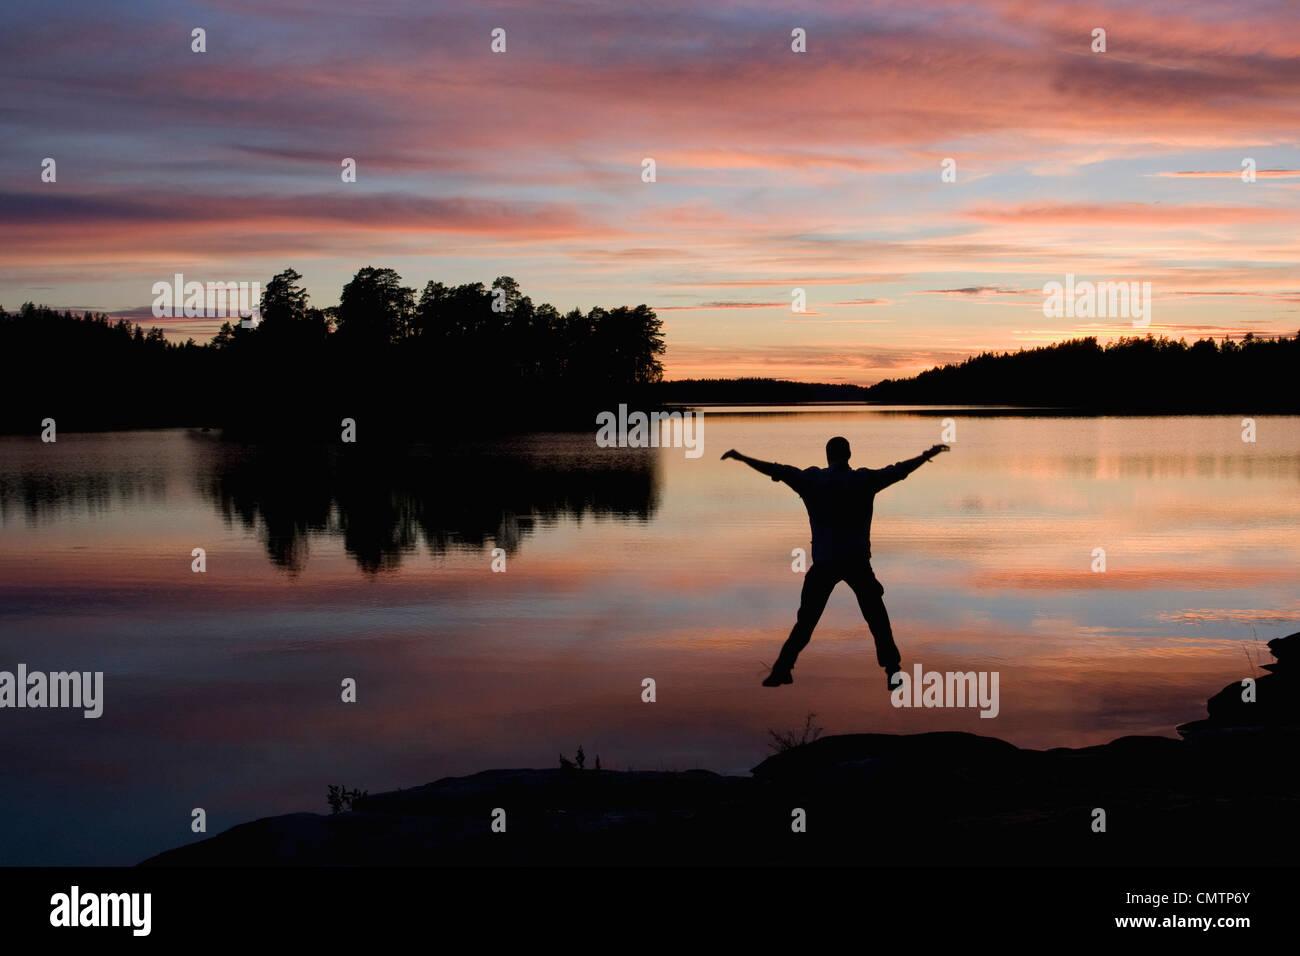 Mann springt im Wasser bei Sonnenuntergang Stockbild